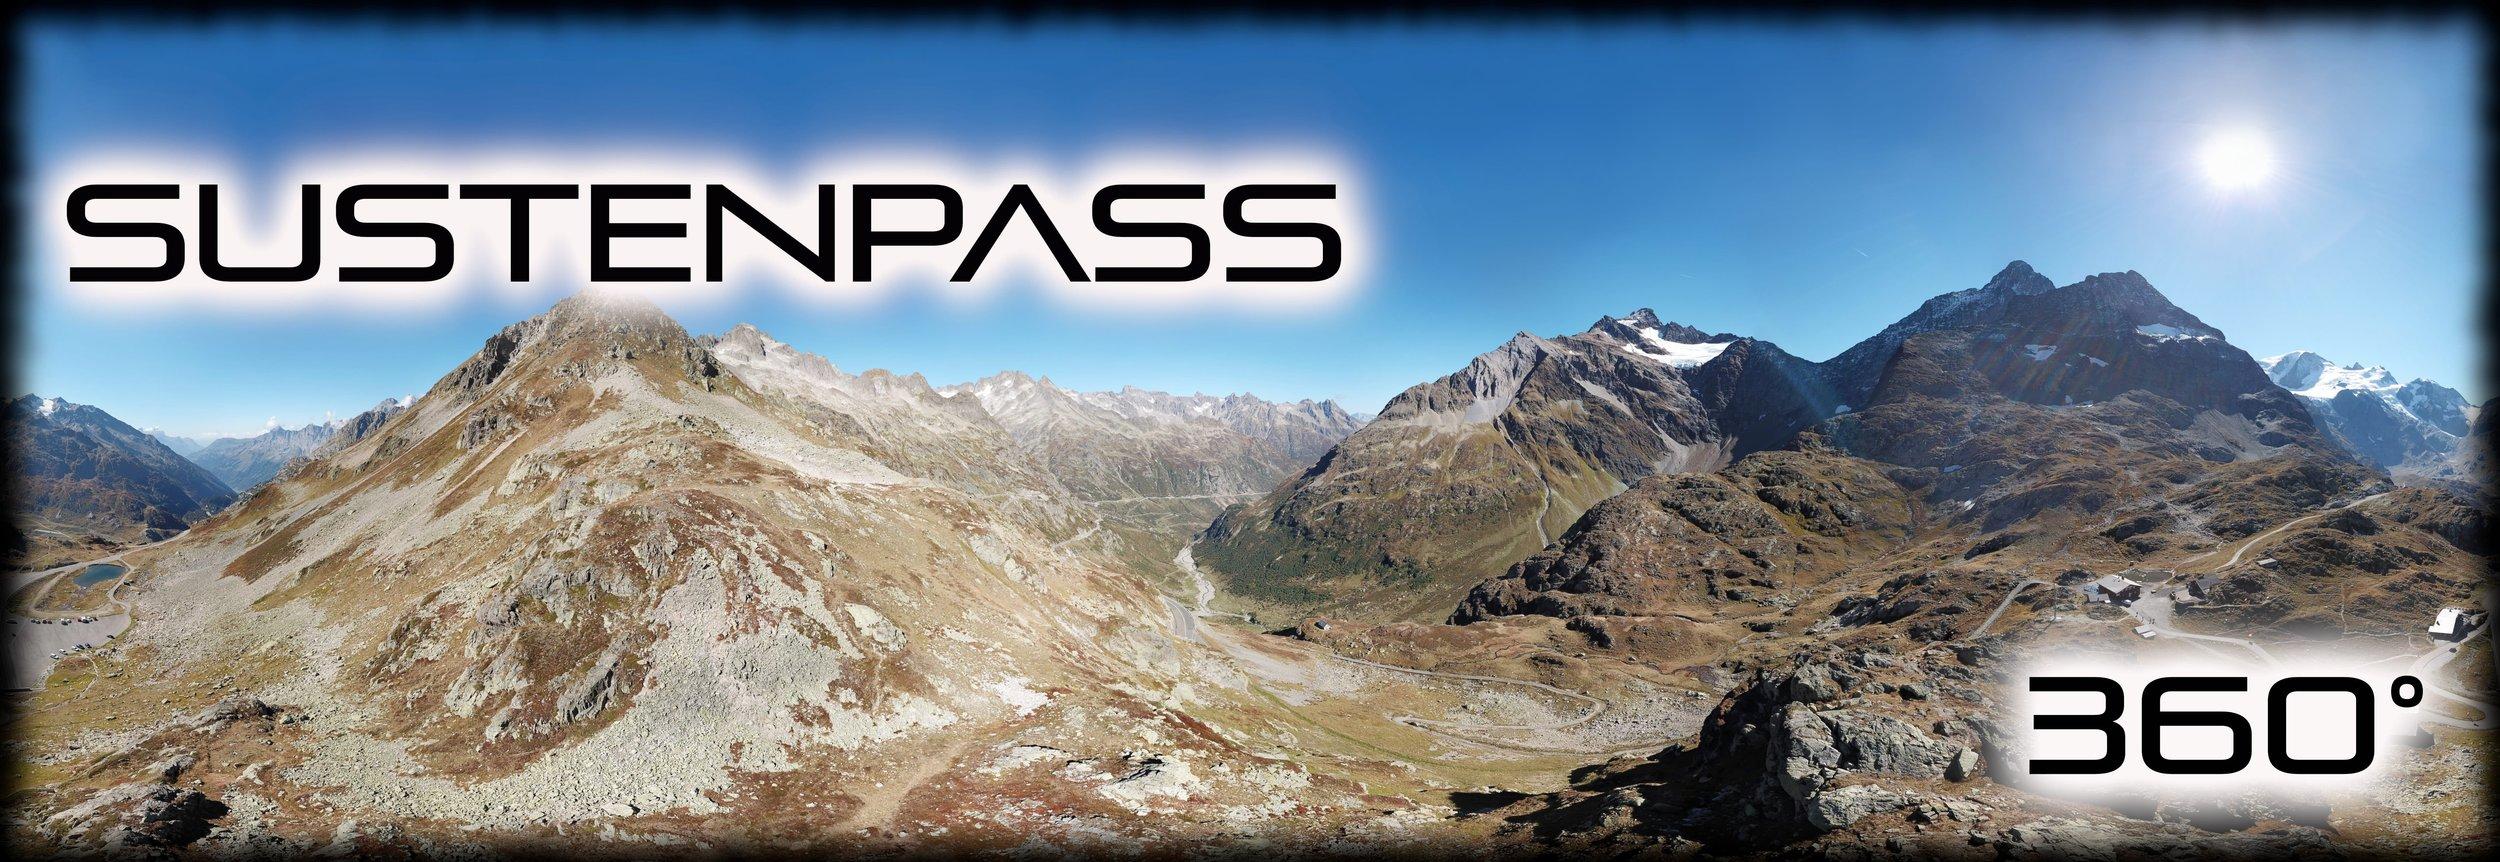 Sustenpass - September 2018